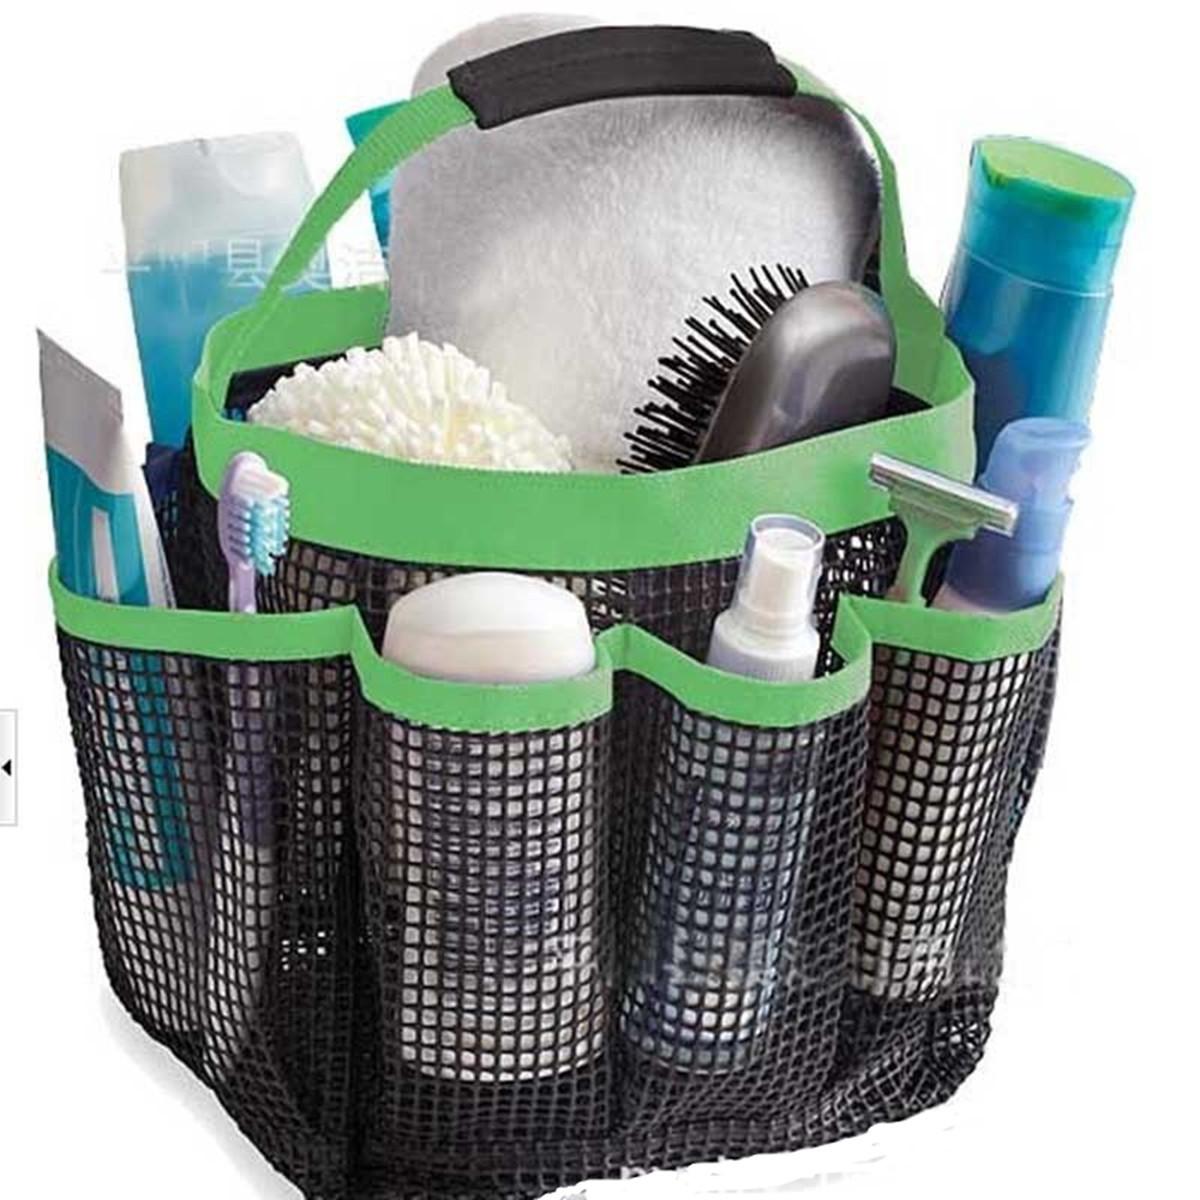 Portable Shower Bag : Shower bath caddy mesh pockets portable tote organizer